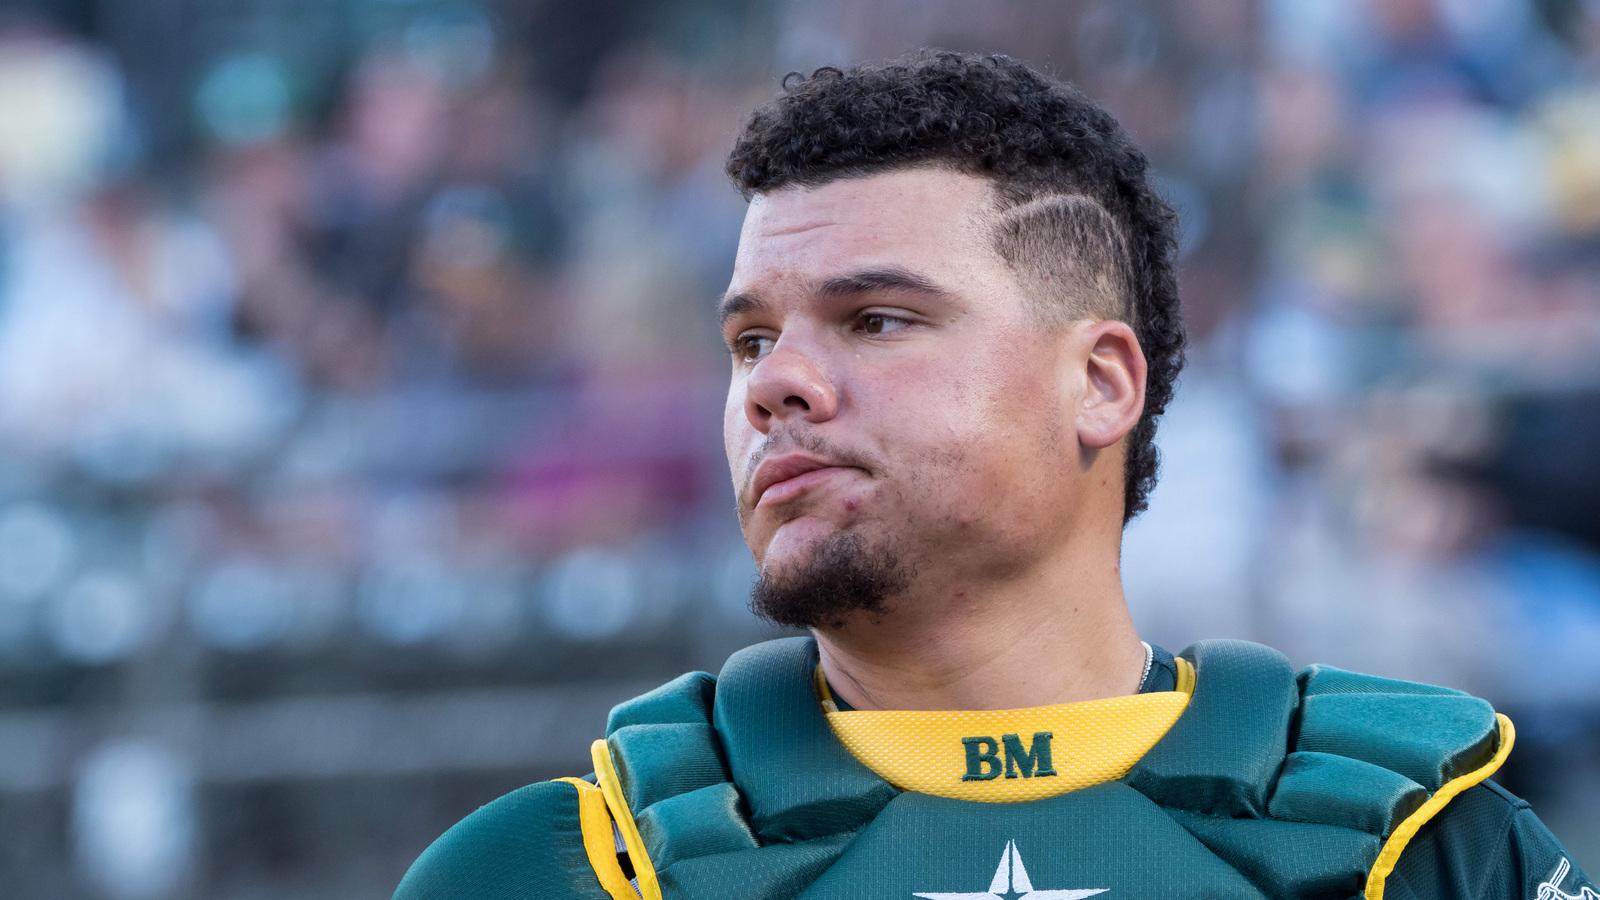 A's Maxwell reaches plea deal and awaits Major League Baseball  decision on discipline